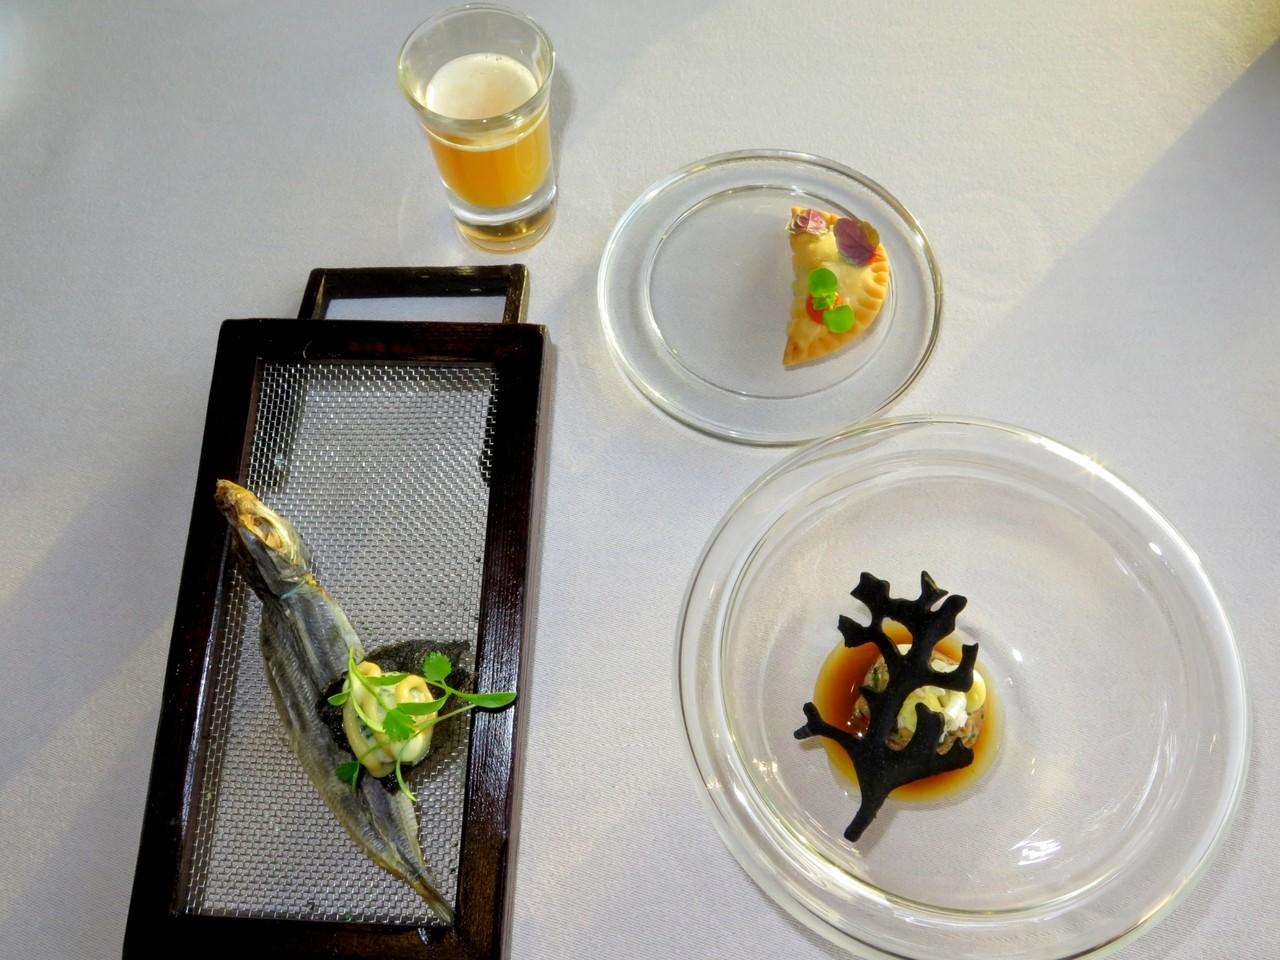 Os primeiros snacks de Miguel Rocha Vieira